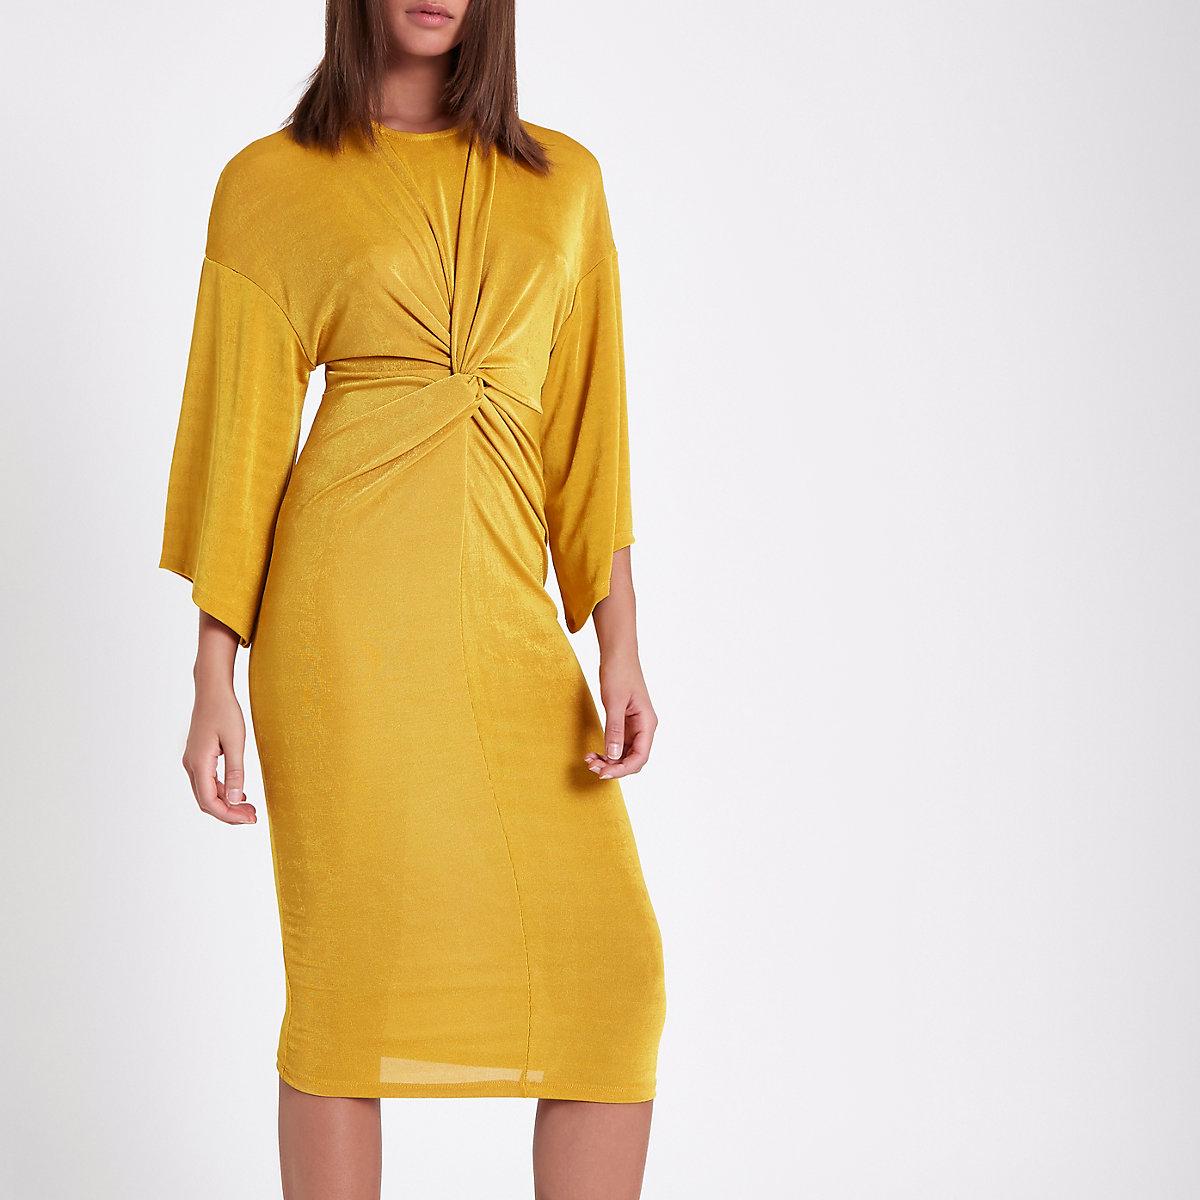 Yellow knot front midi dress